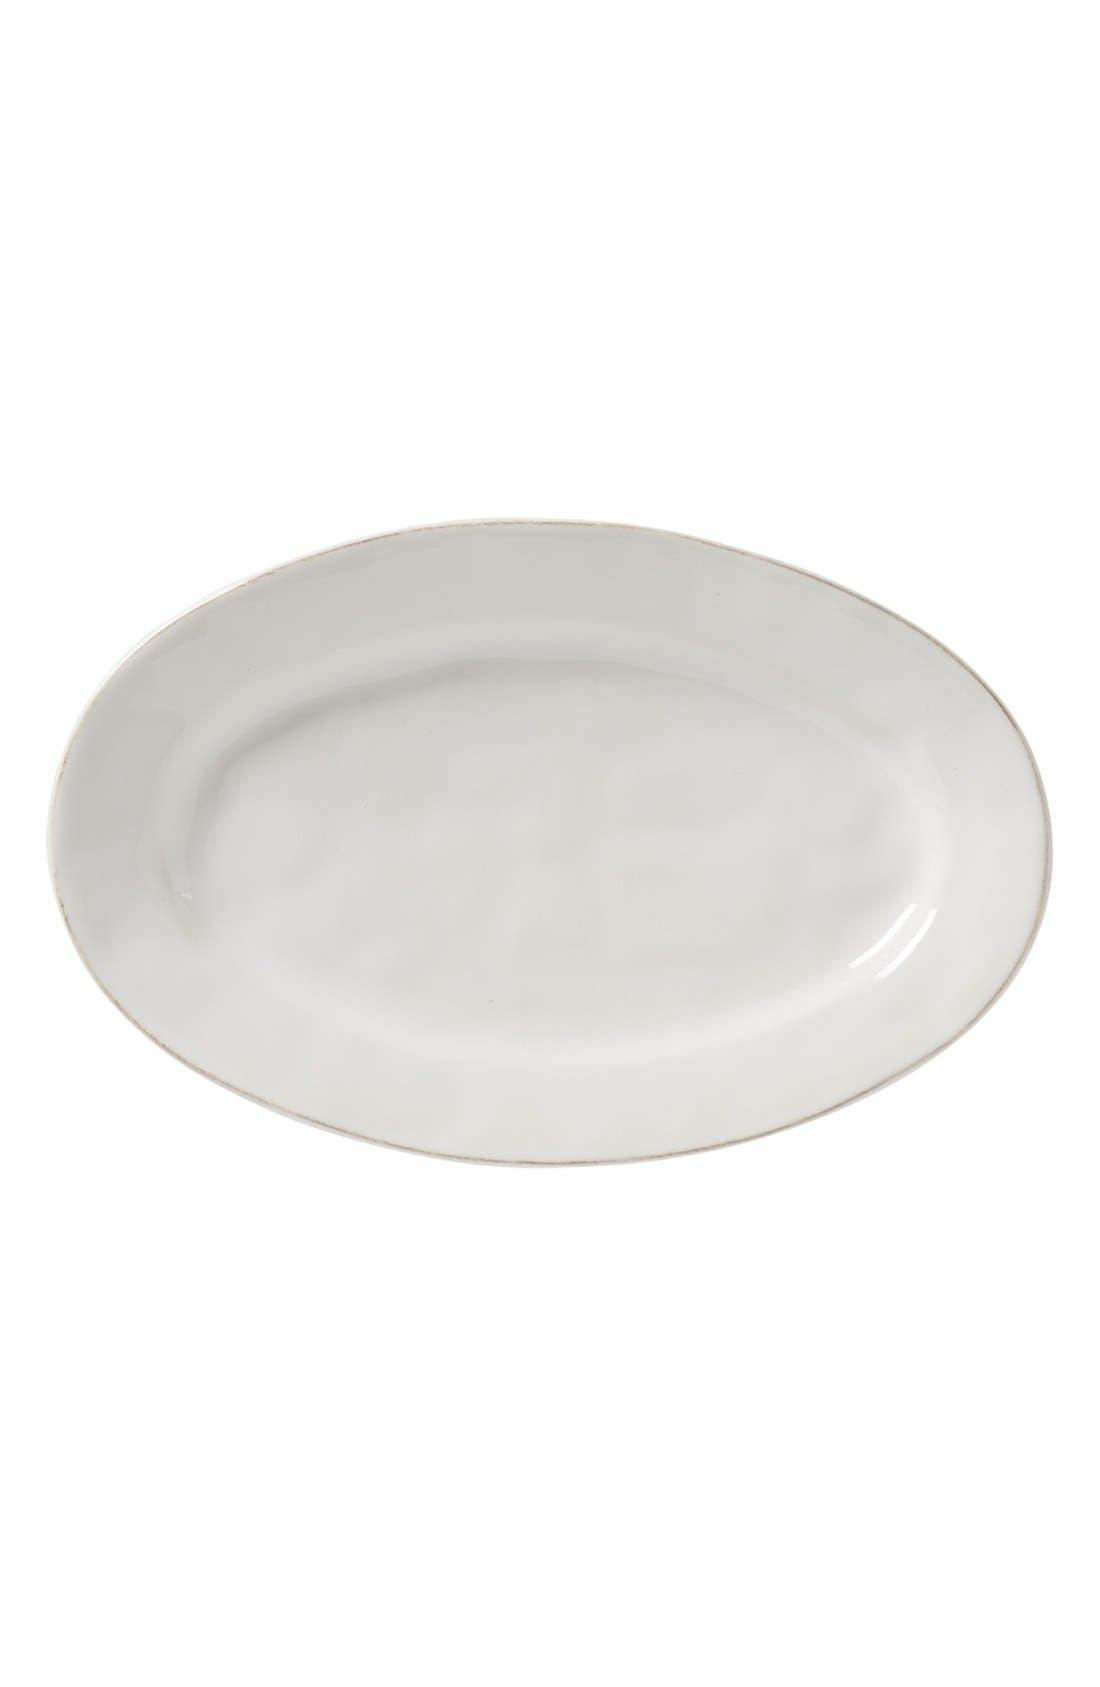 'Puro' Oval Platter,                         Main,                         color, White